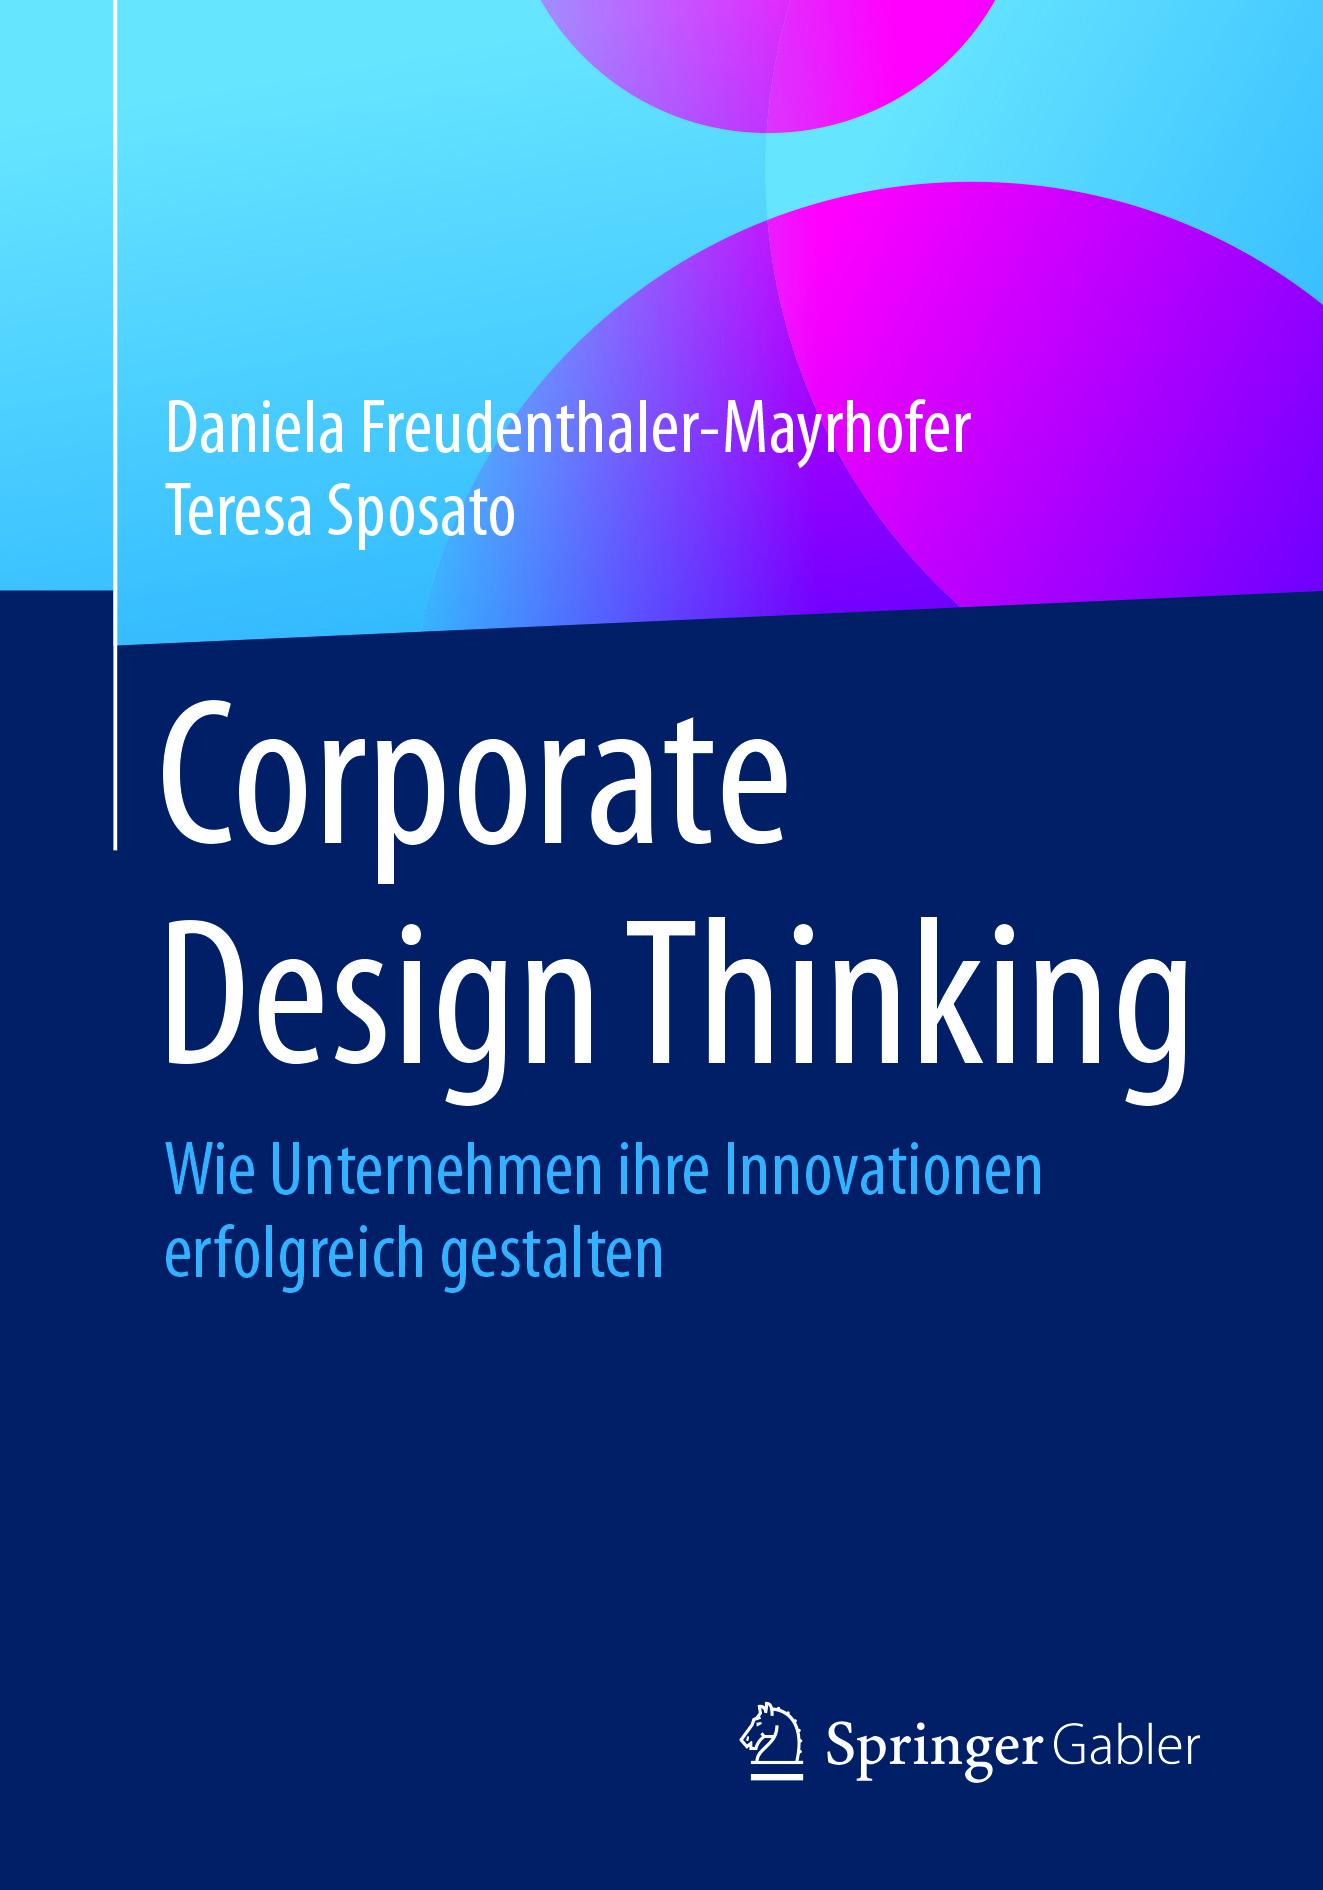 Freudenthaler-Mayrhofer, Daniela - Corporate Design Thinking, ebook